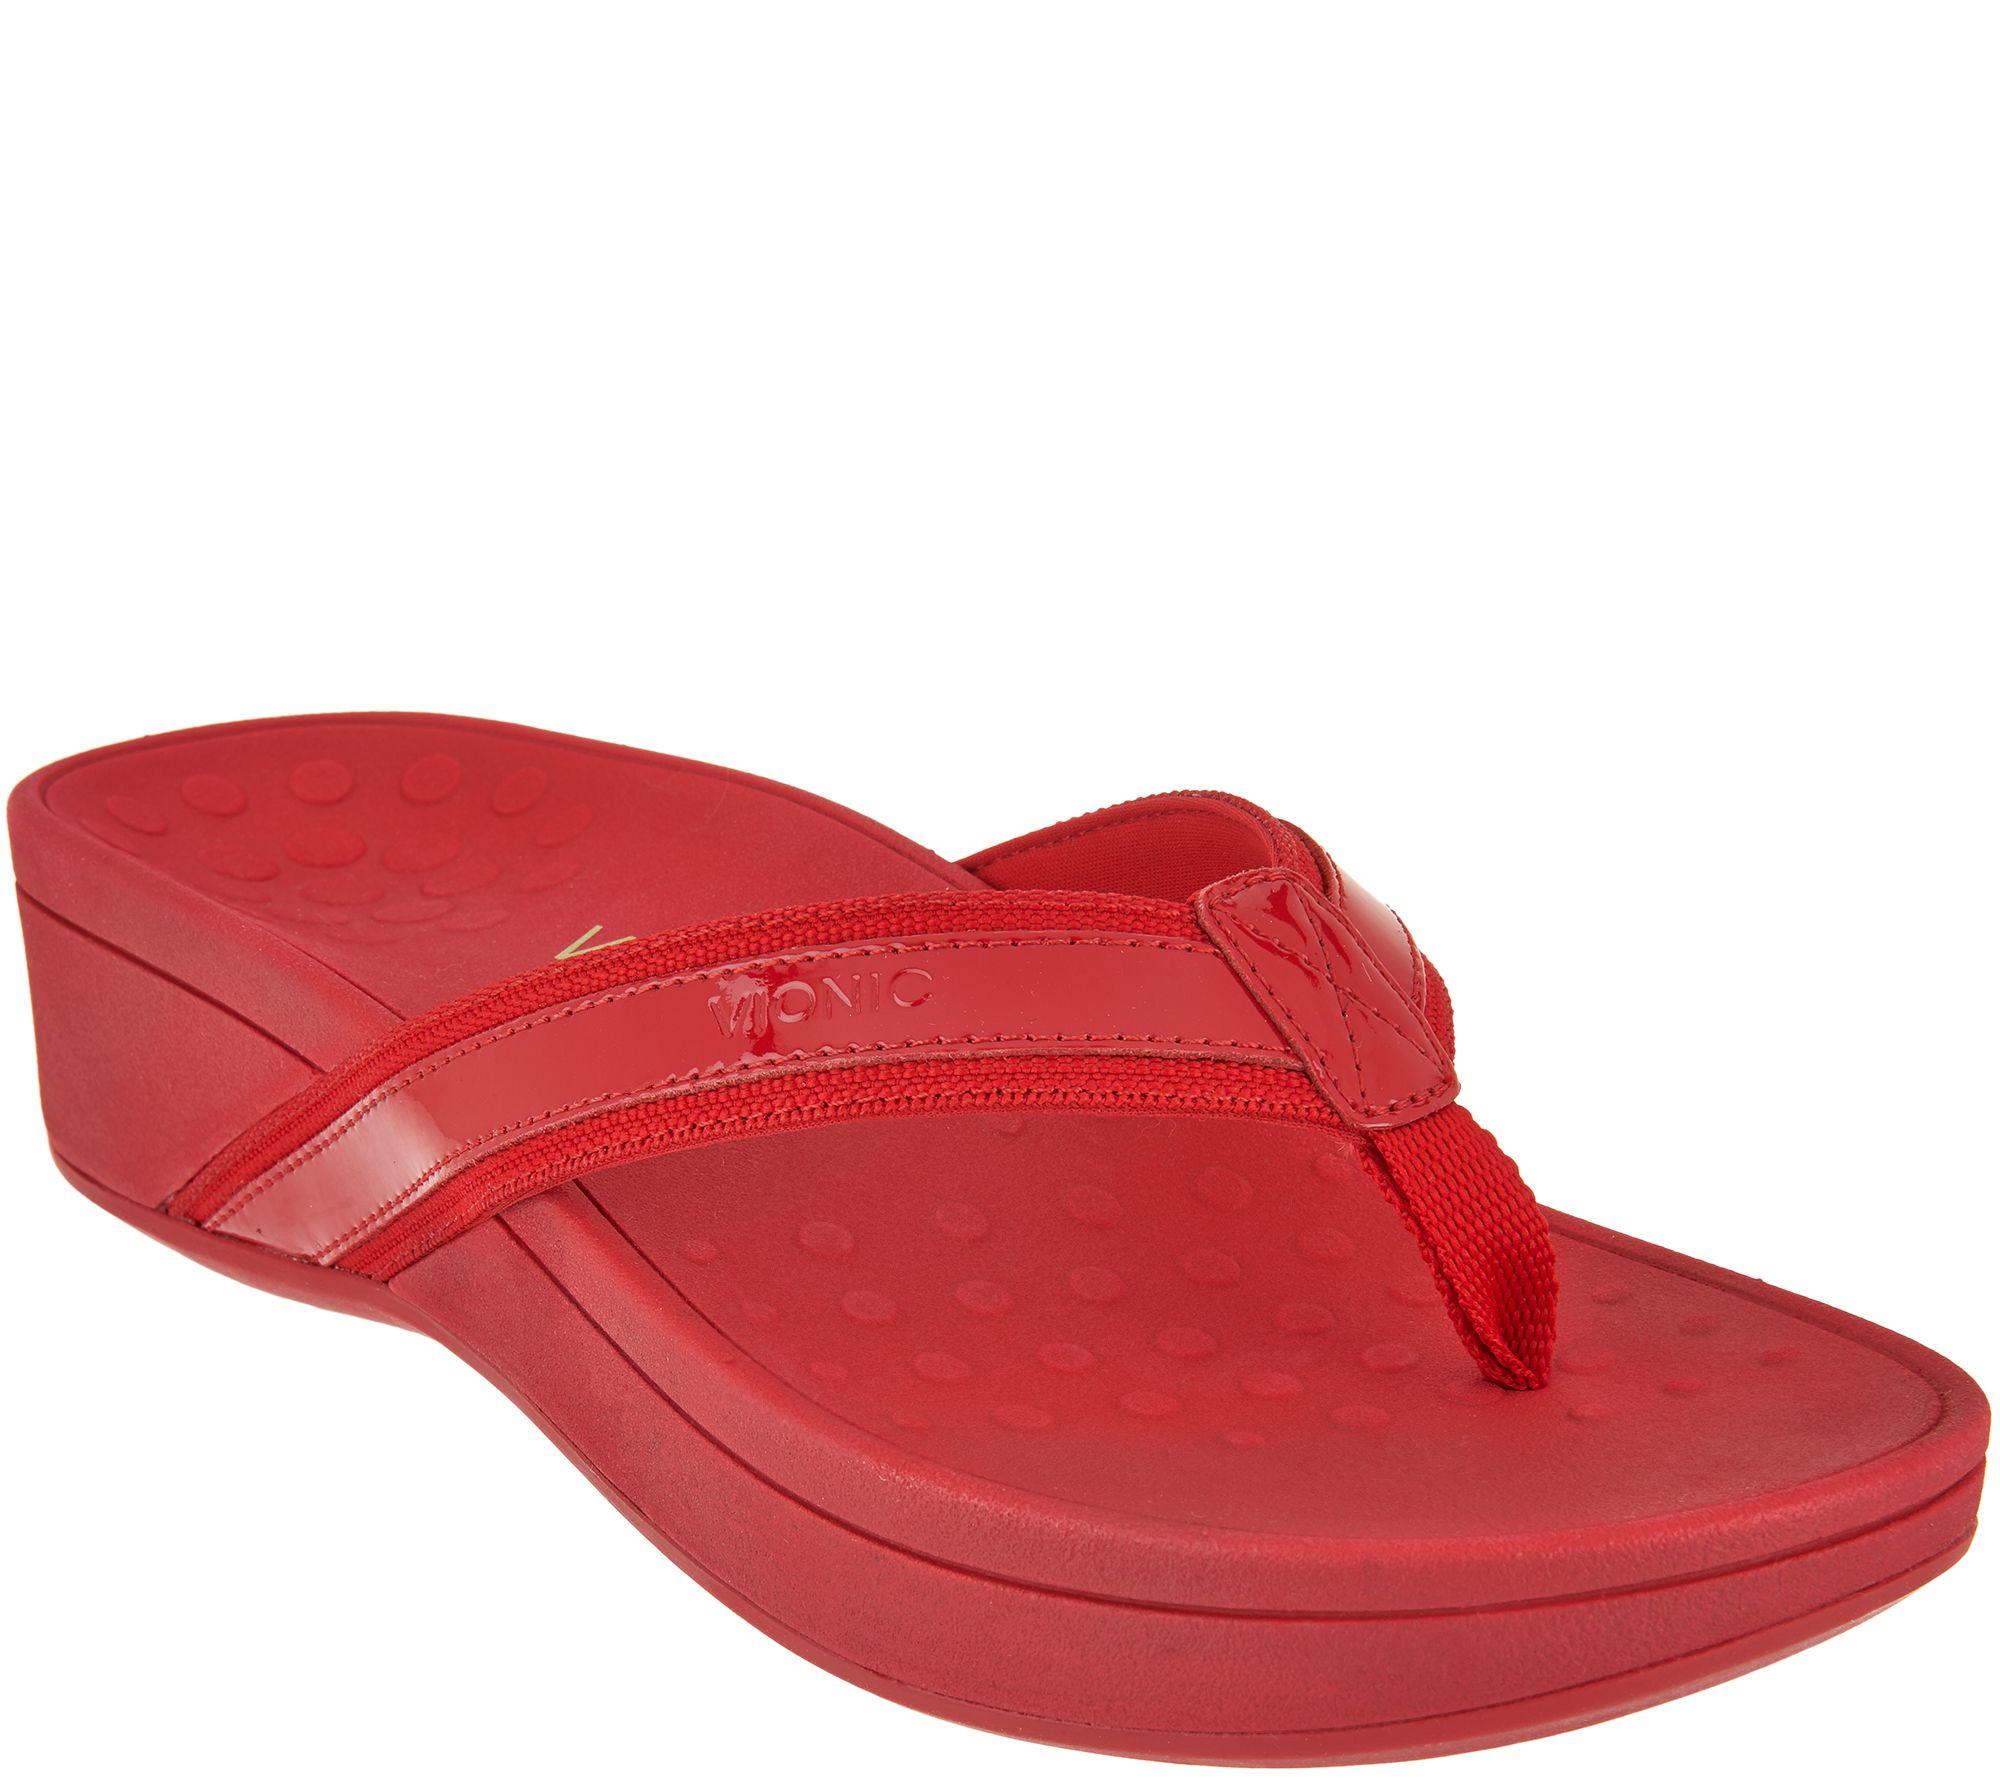 8390f8daba3 Vionic Platform Leather Sandals - High Tide - Page 1 — QVC.com